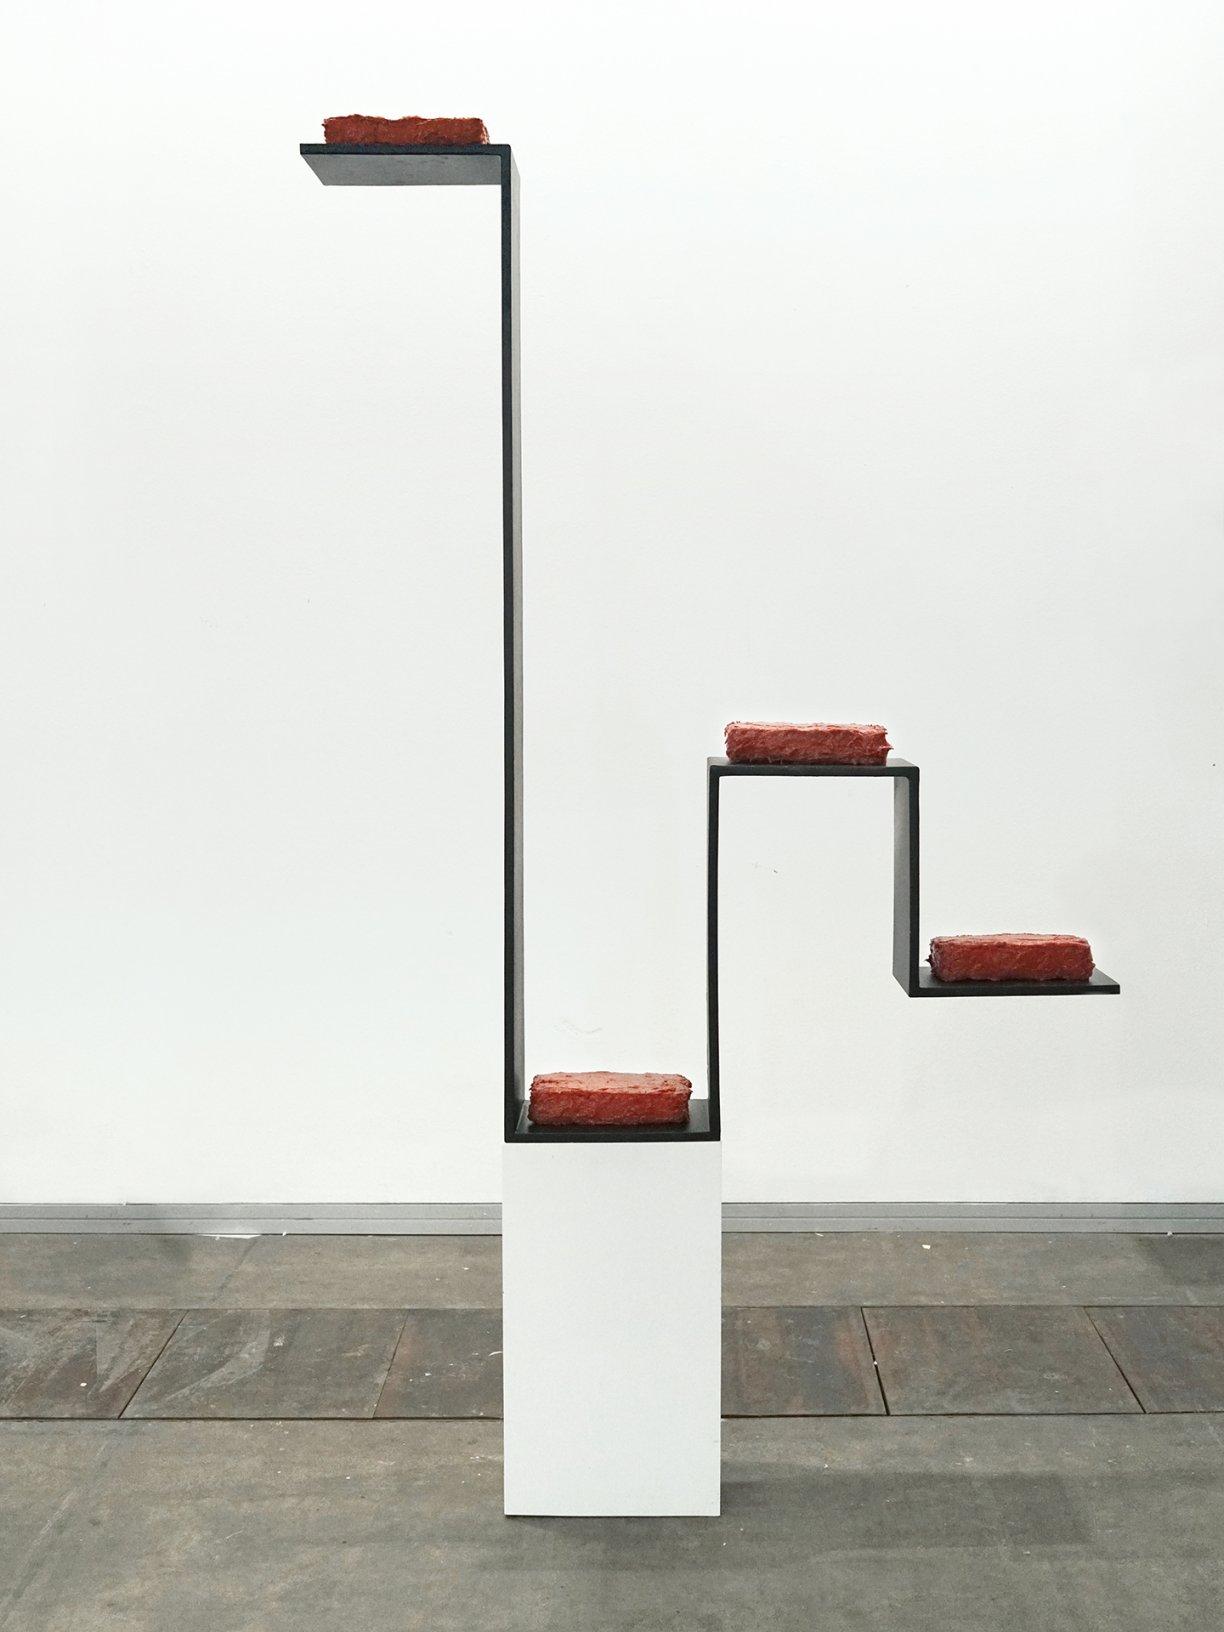 Componente (Destierro) #3 (2018) - Martín Touzon